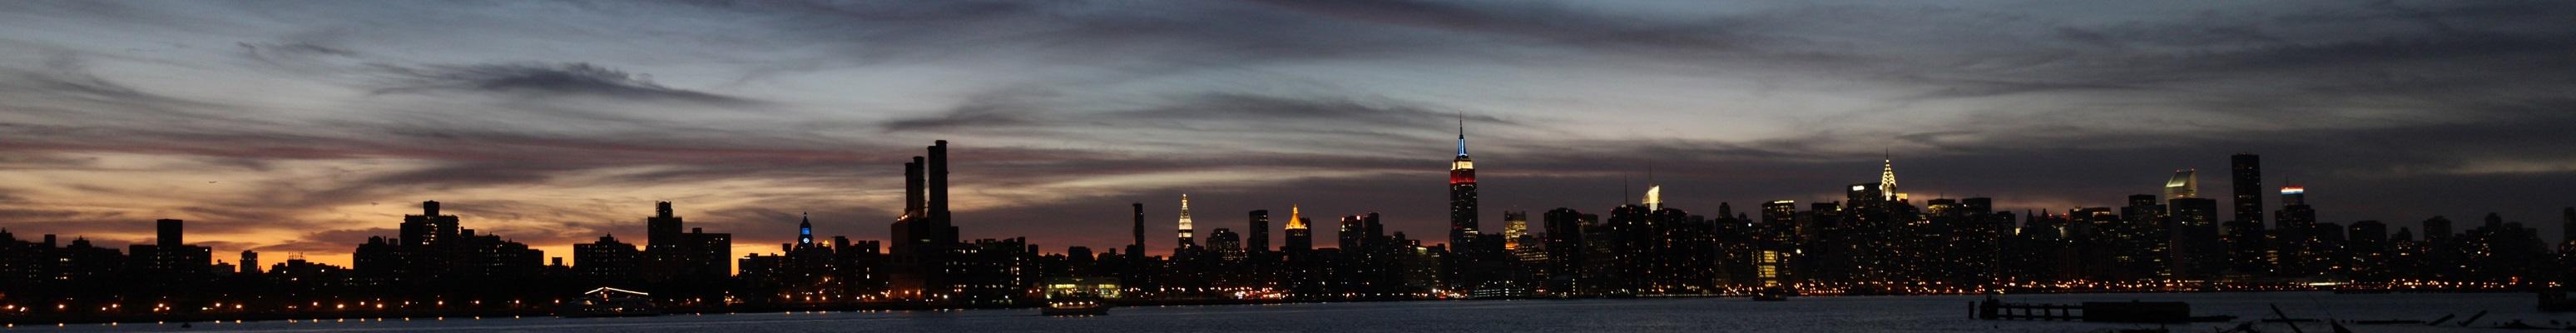 🗽 New York & Cityscape 🗽